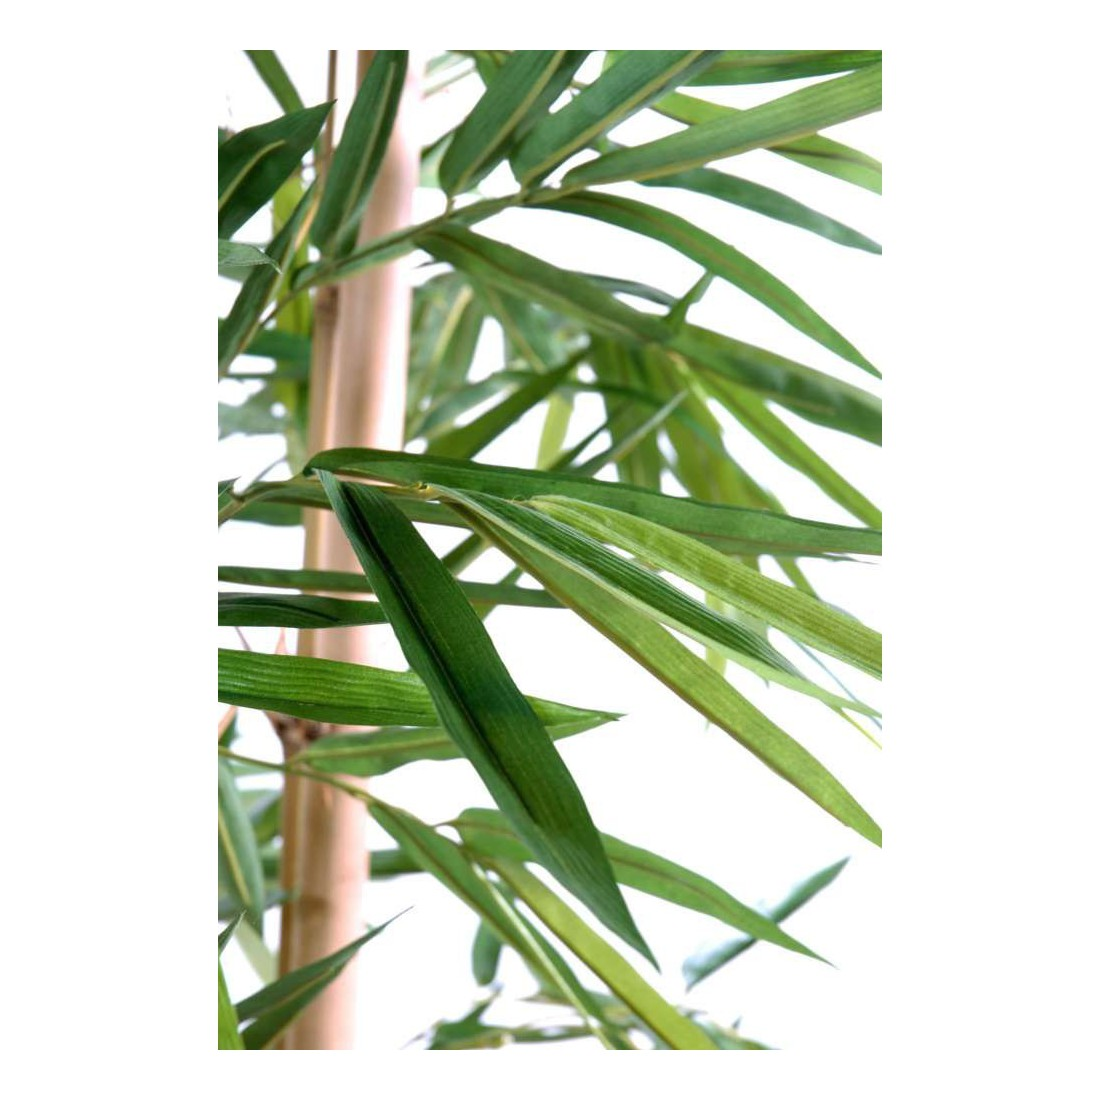 bambou artificiel 3 troncs feuille large 210 et 270 cm arbres artificiels reflets. Black Bedroom Furniture Sets. Home Design Ideas